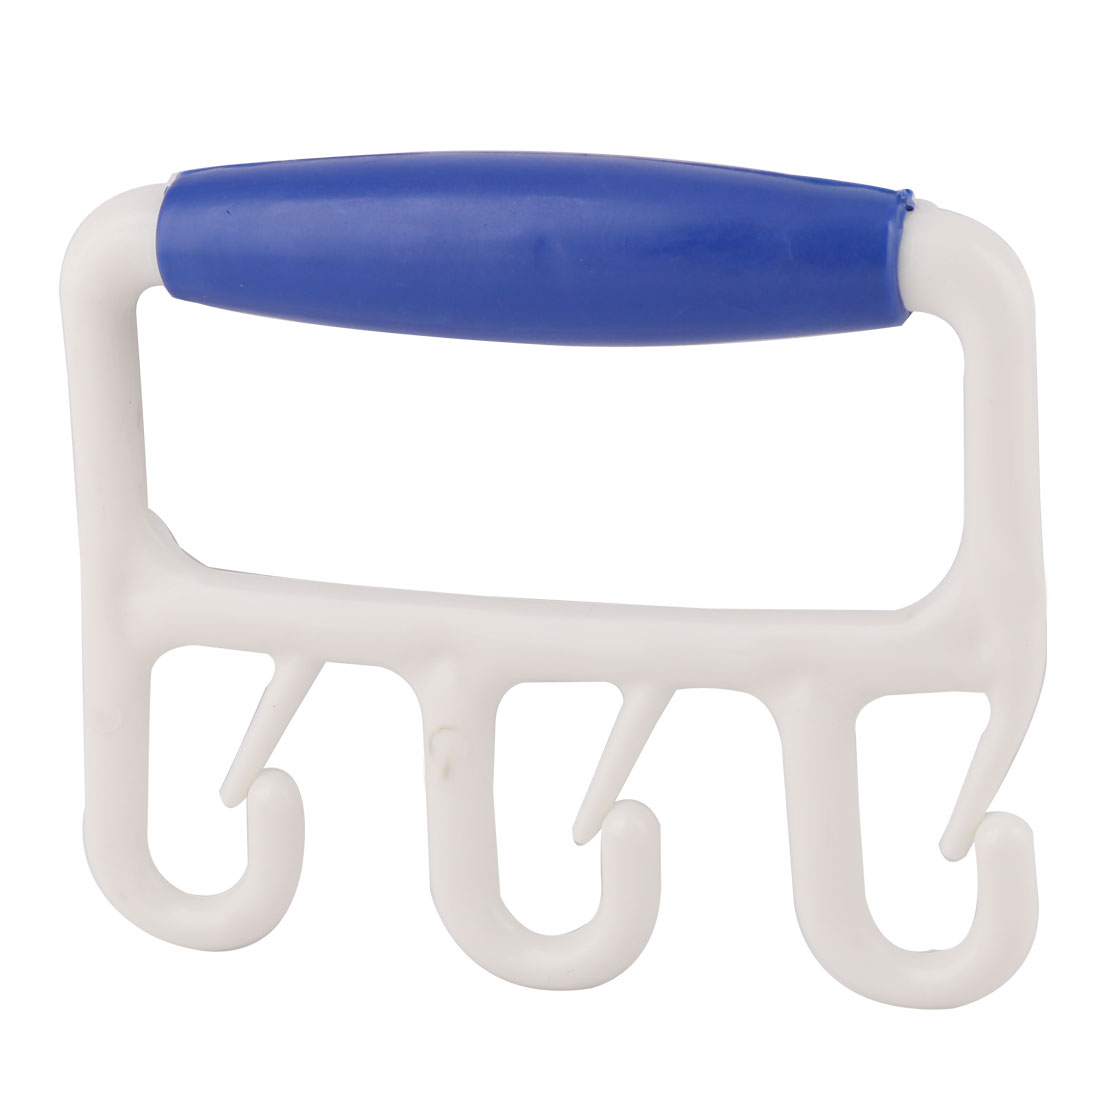 Houshold Plastic Three Hook Shopping Grocery Bag Grip Holder Handle Carrier Tool Blue